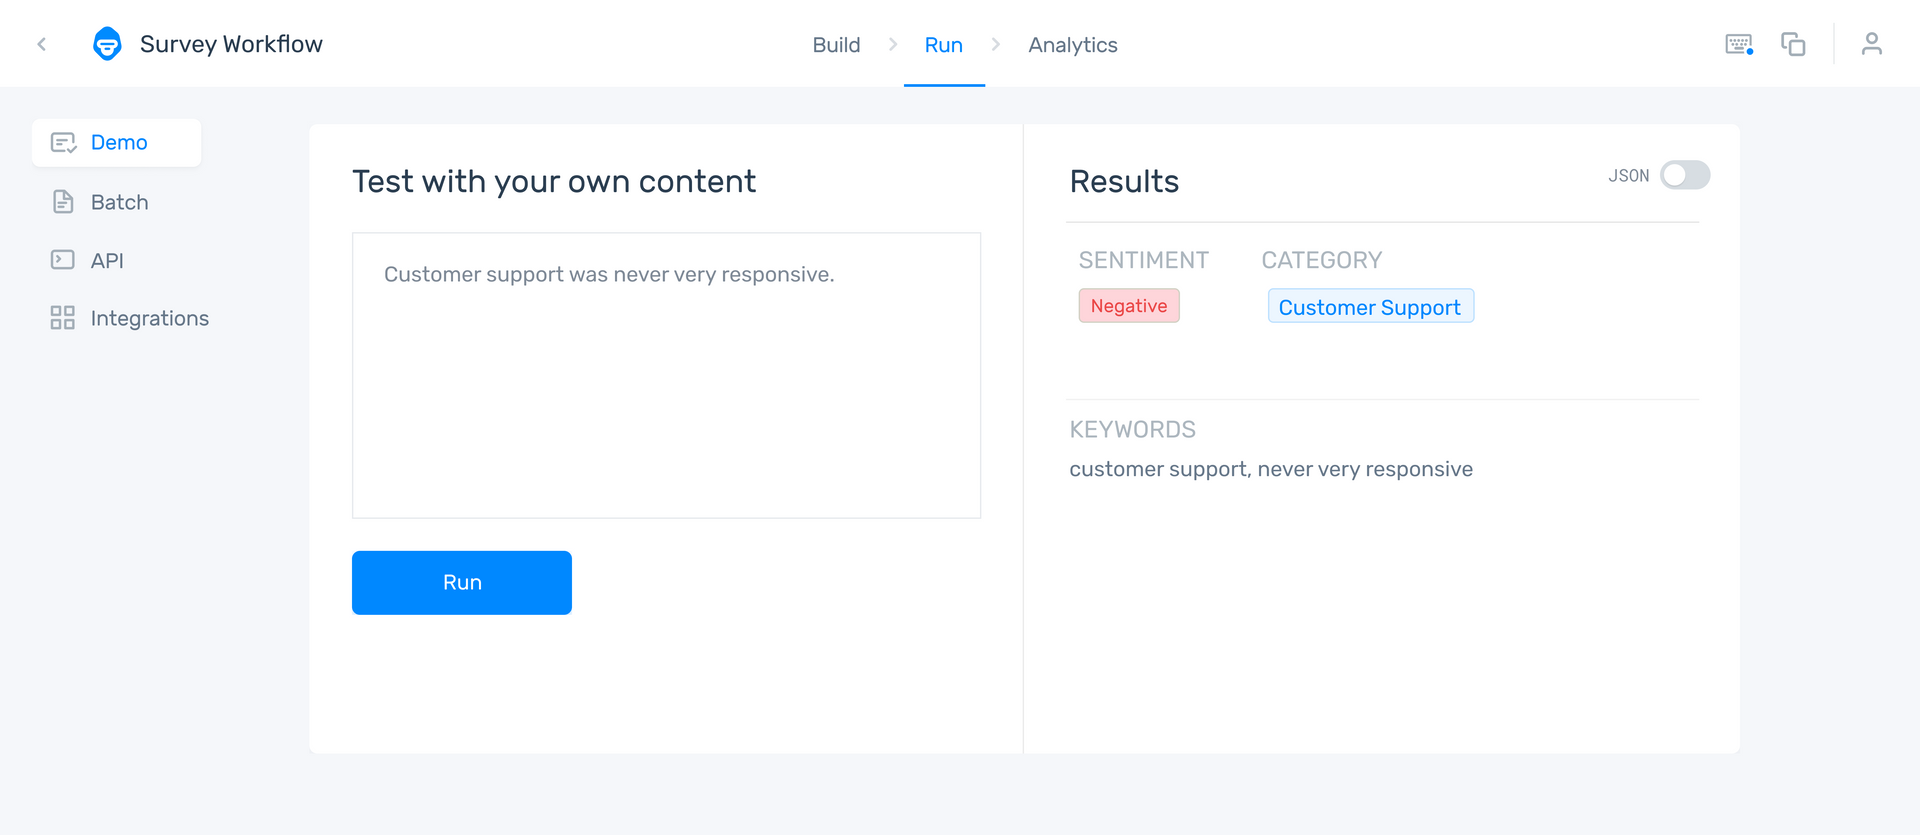 Monkeylearn's aspect based sentiment analyzer classifying a survey response.